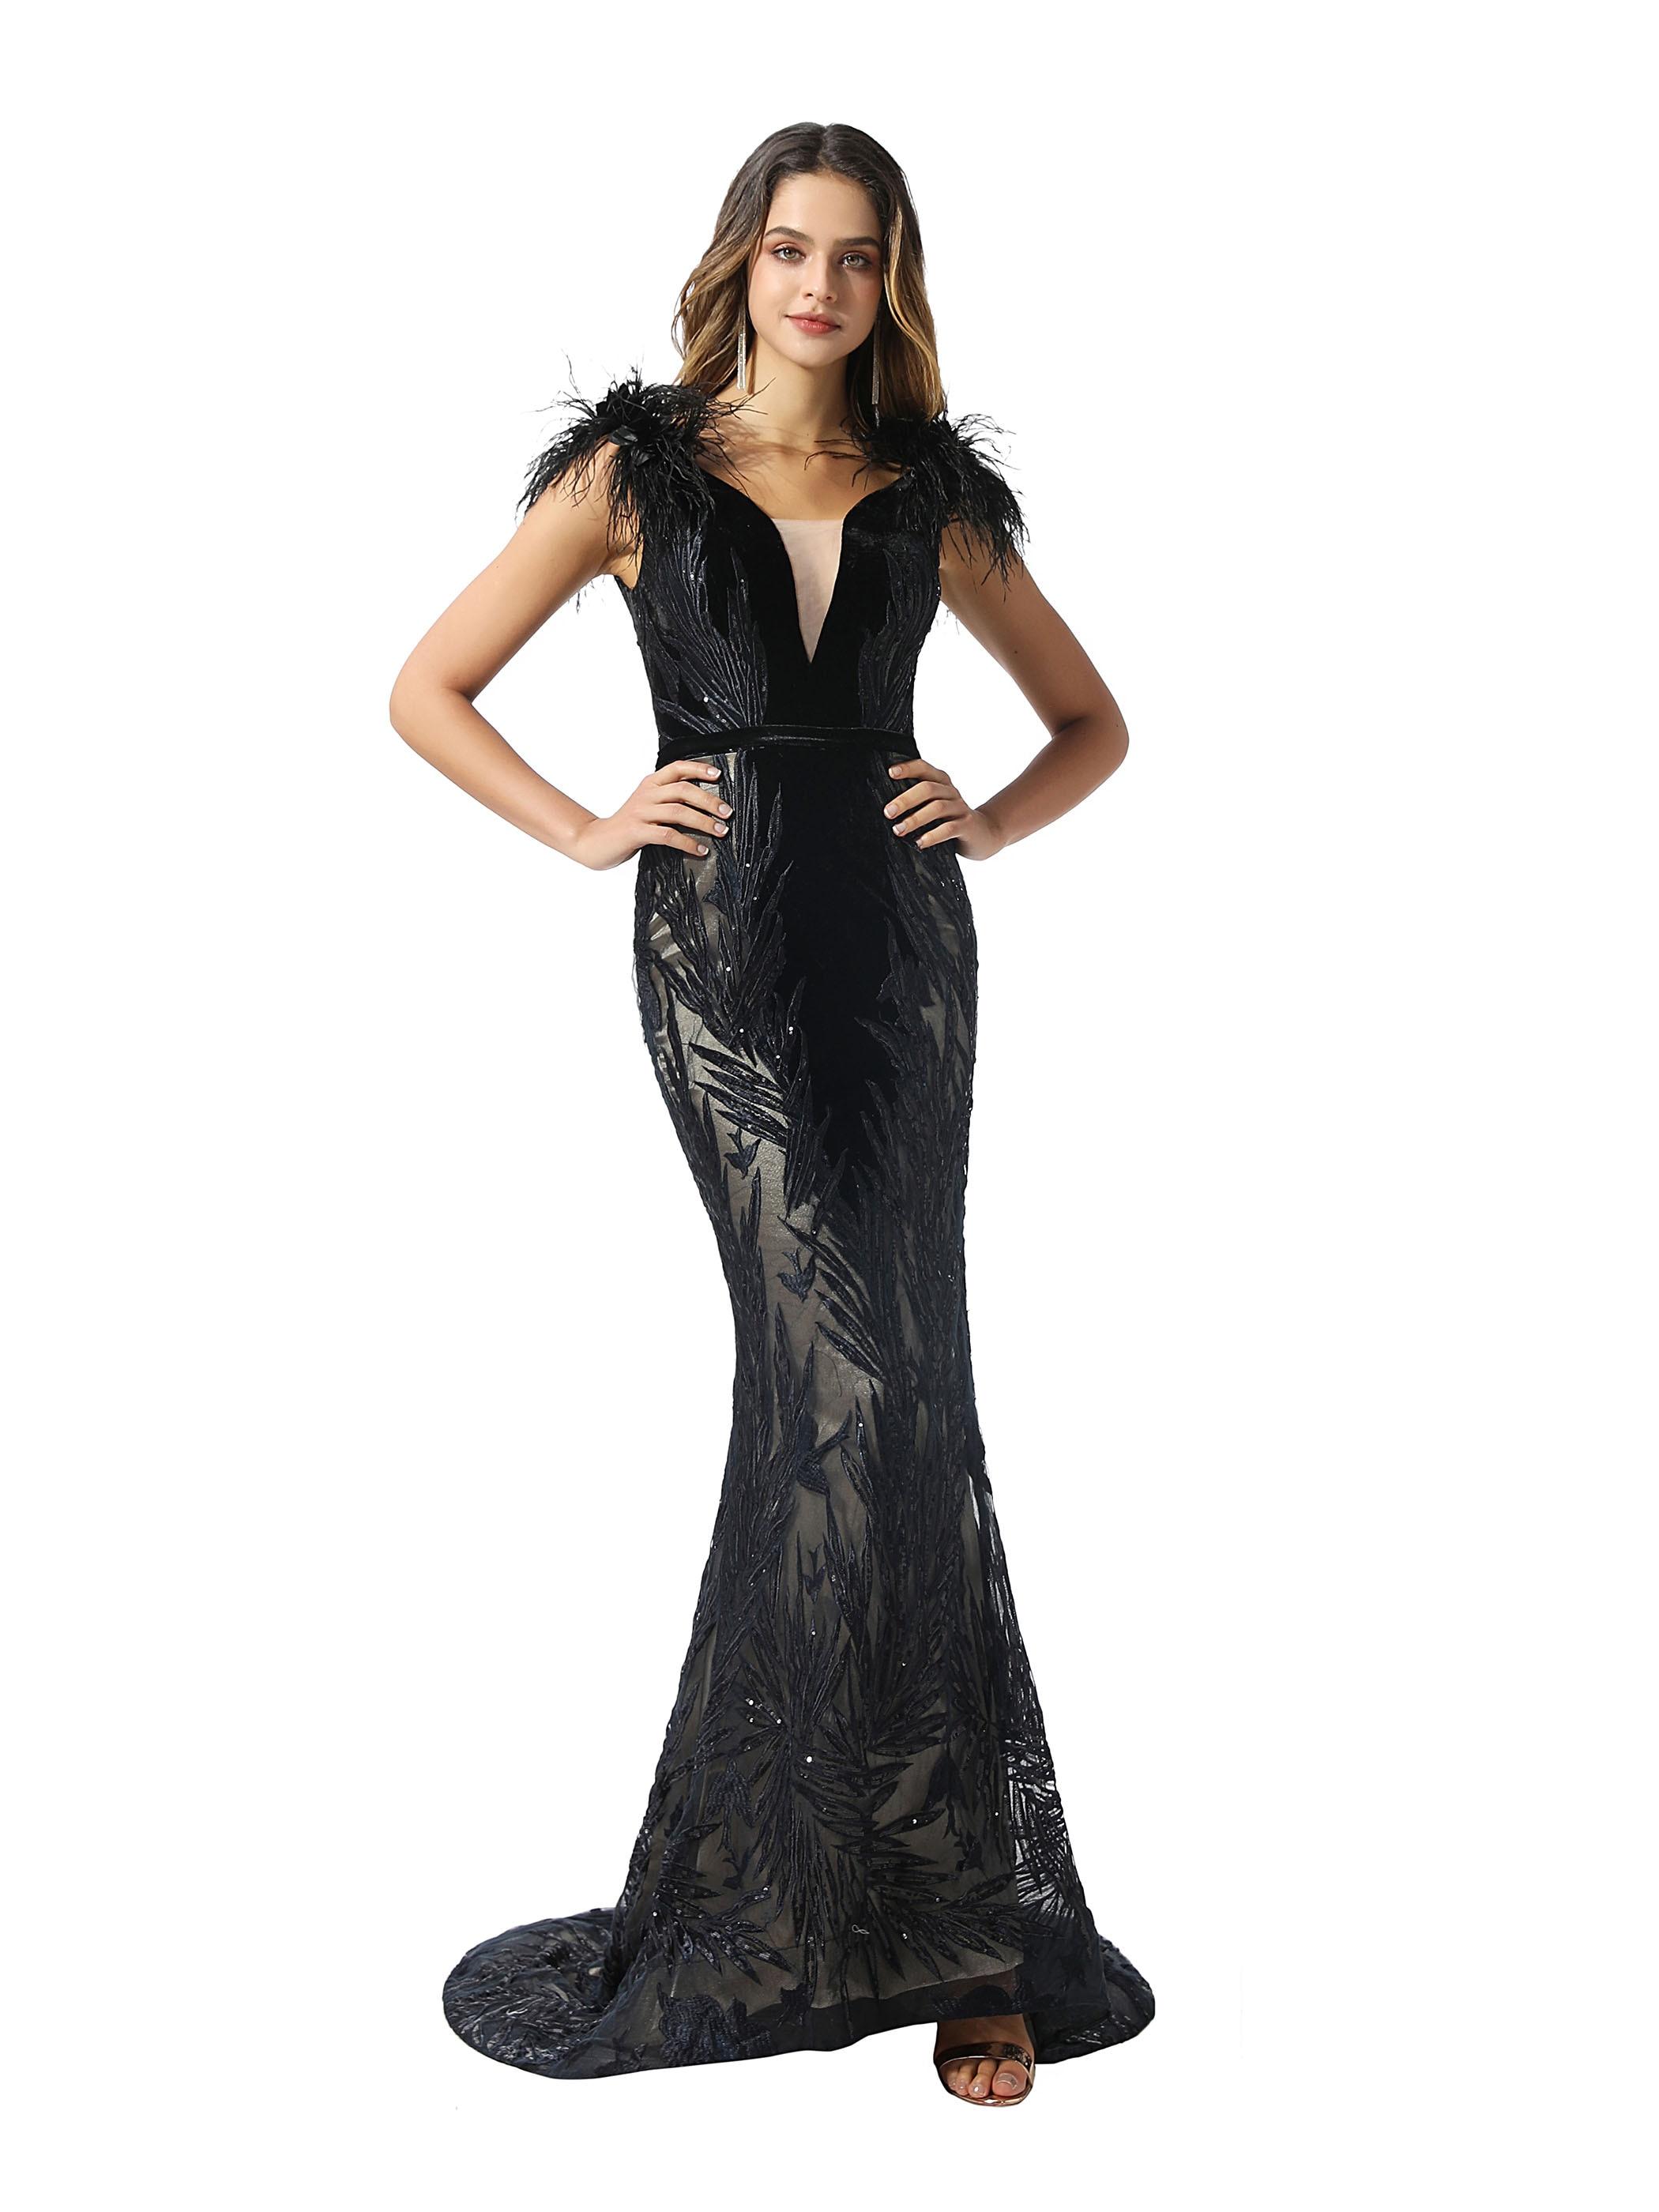 Tanpell Black V-Neck Mermaid Evening Dress Feather Sequin Lace Sleeveless Floor-Length Women Celebrity Custom Evening Dress 2020